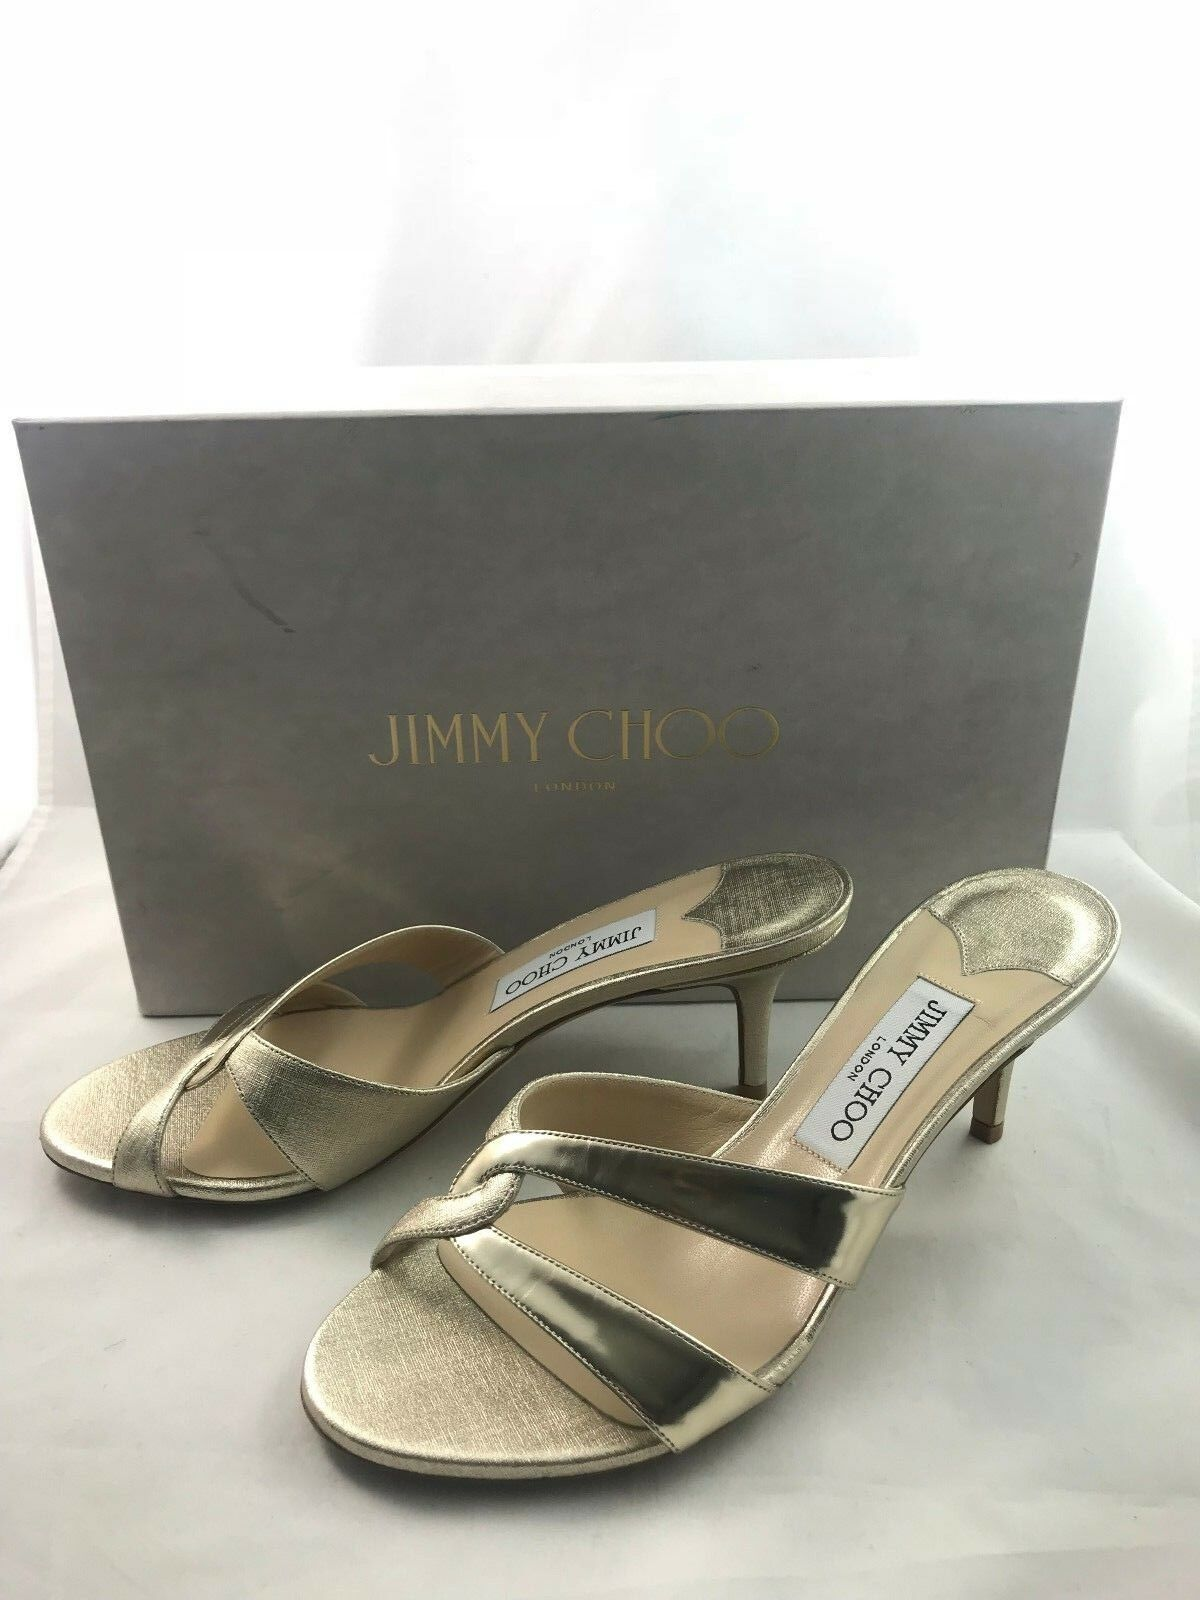 Jimmy Choo Tation Platinum Gold Slide Sandals With Box